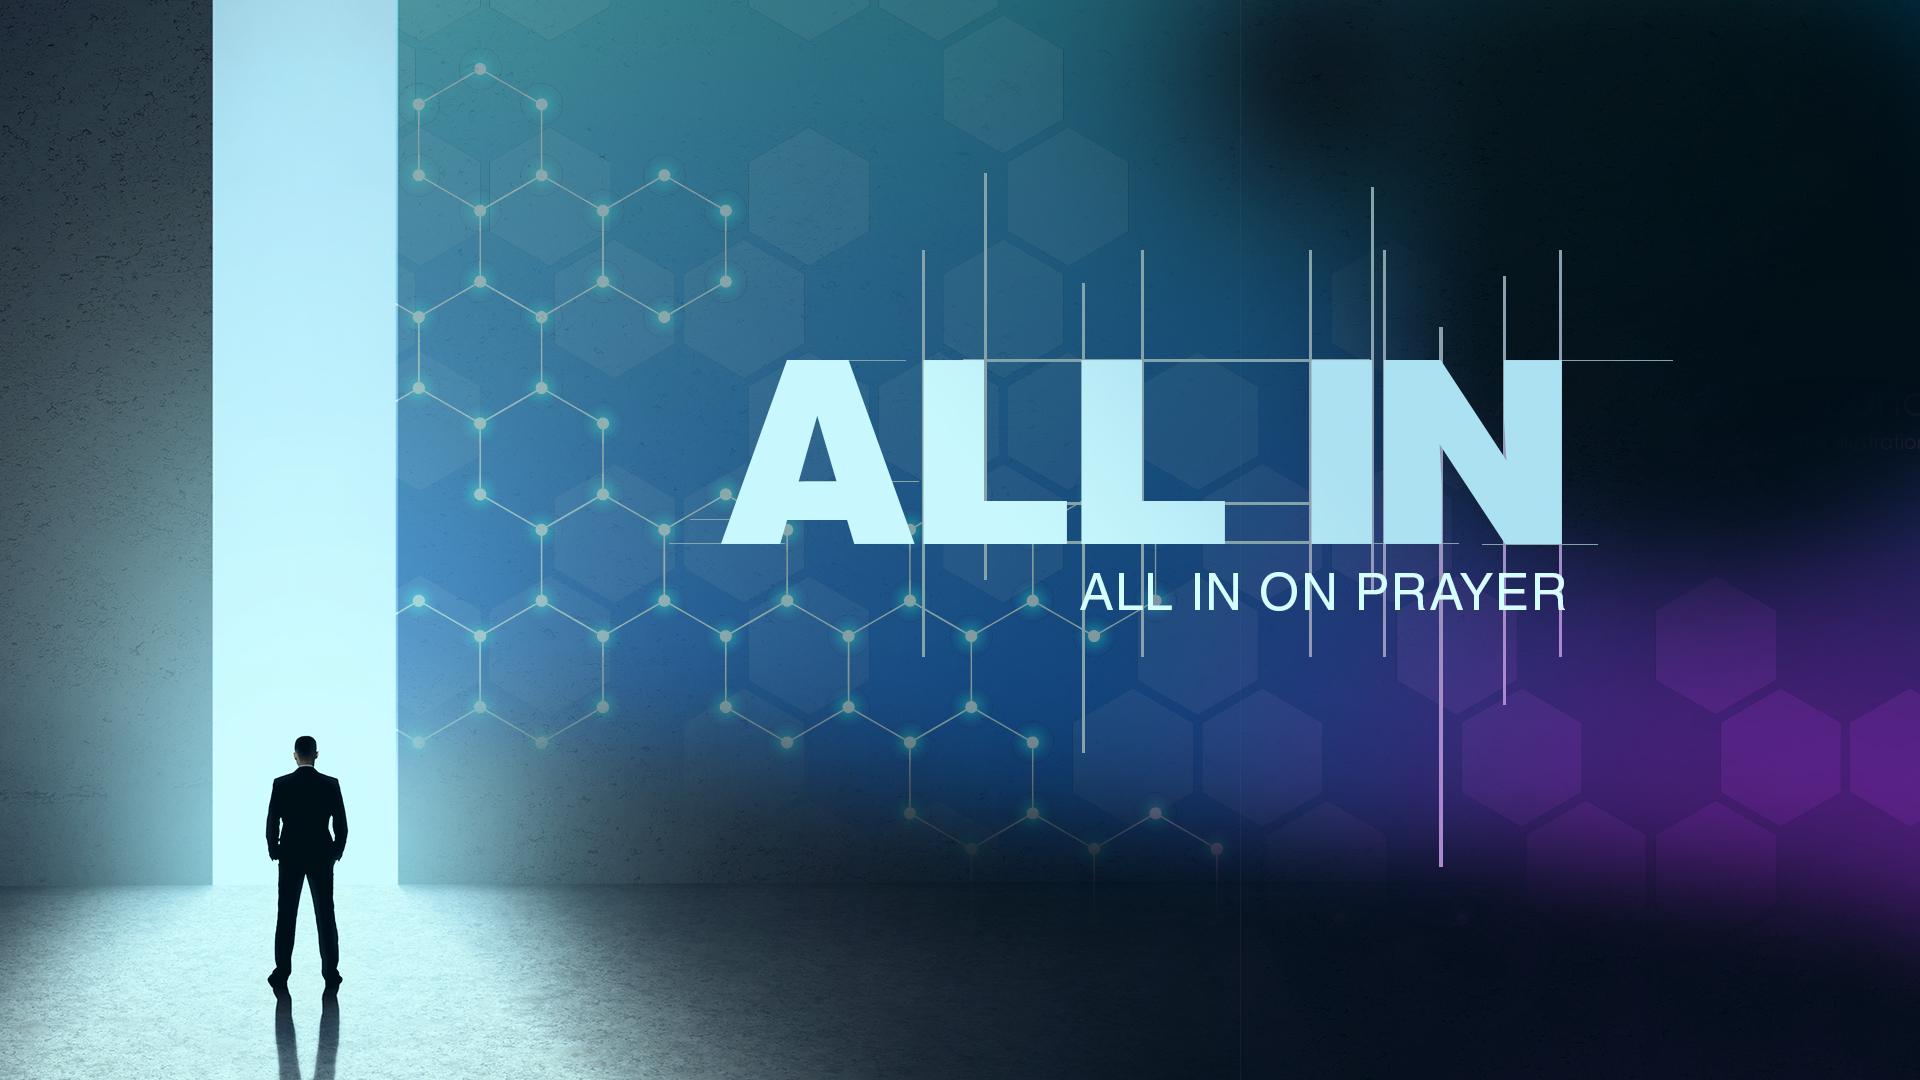 All In On Prayer